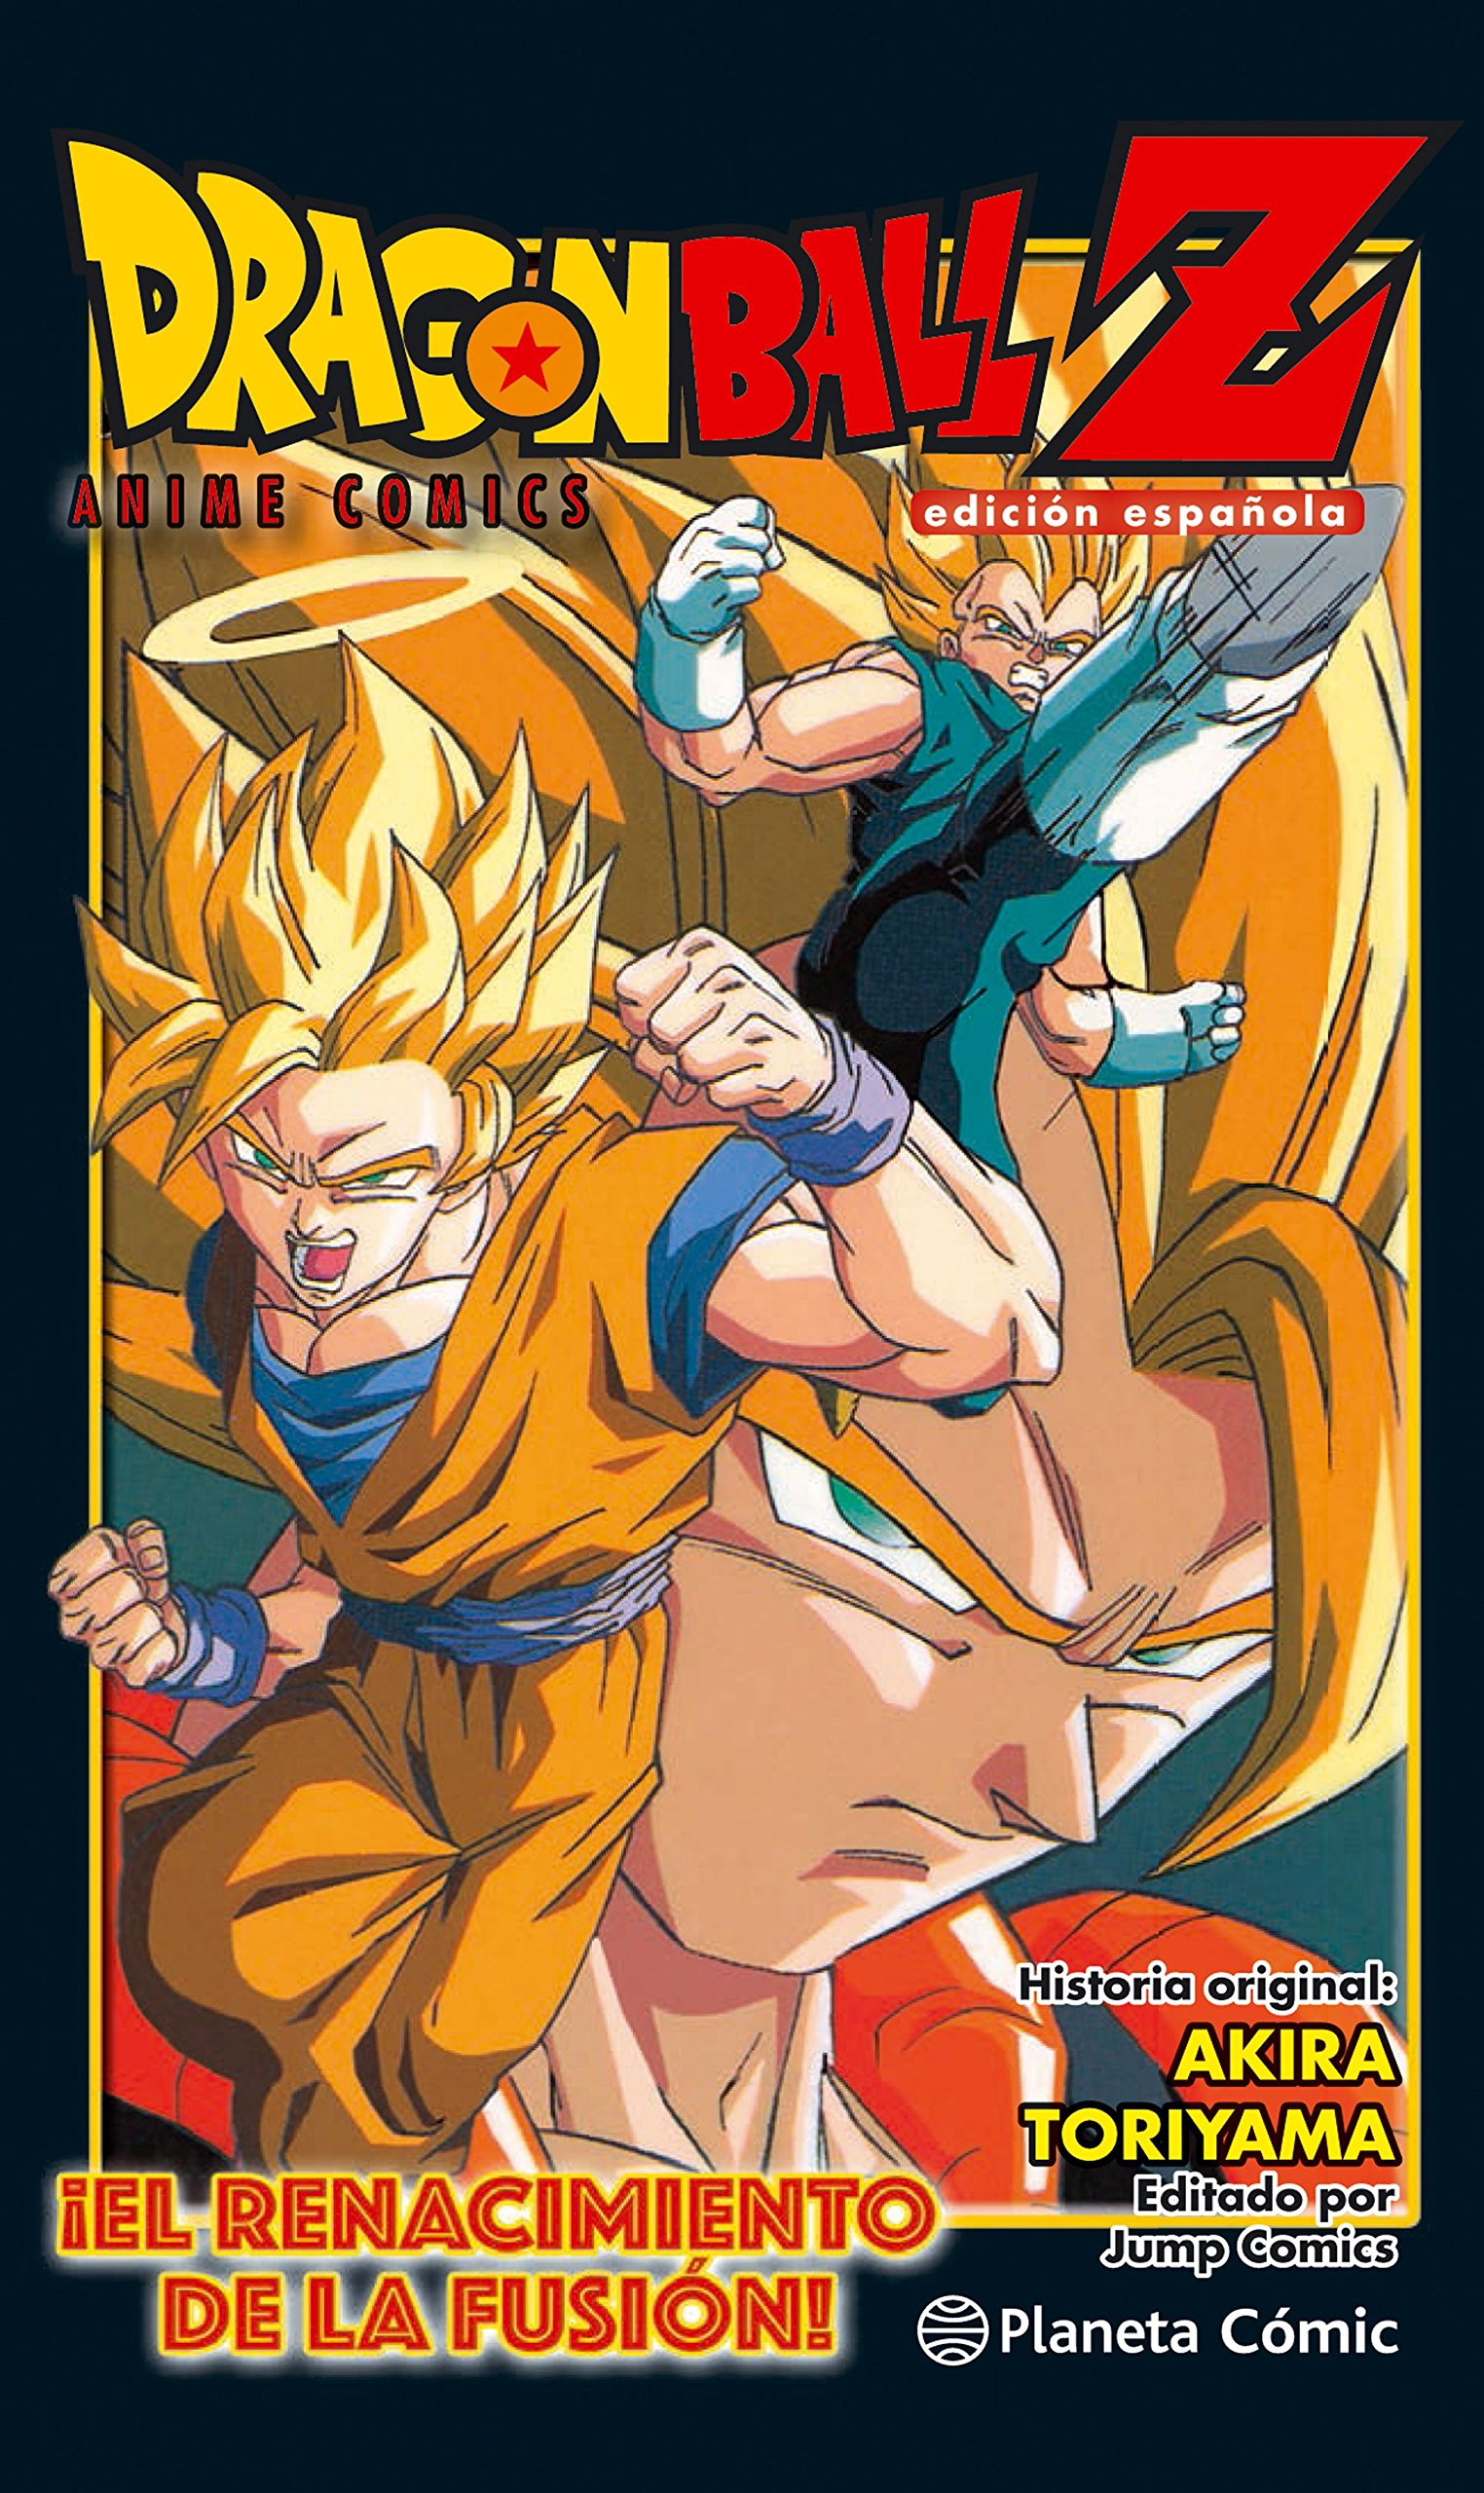 Dragon Ball Z ¡El renacimiento de la fusión! Goku y Vegeta! Manga Shonen: Amazon.es: Toriyama, Akira, Daruma: Libros